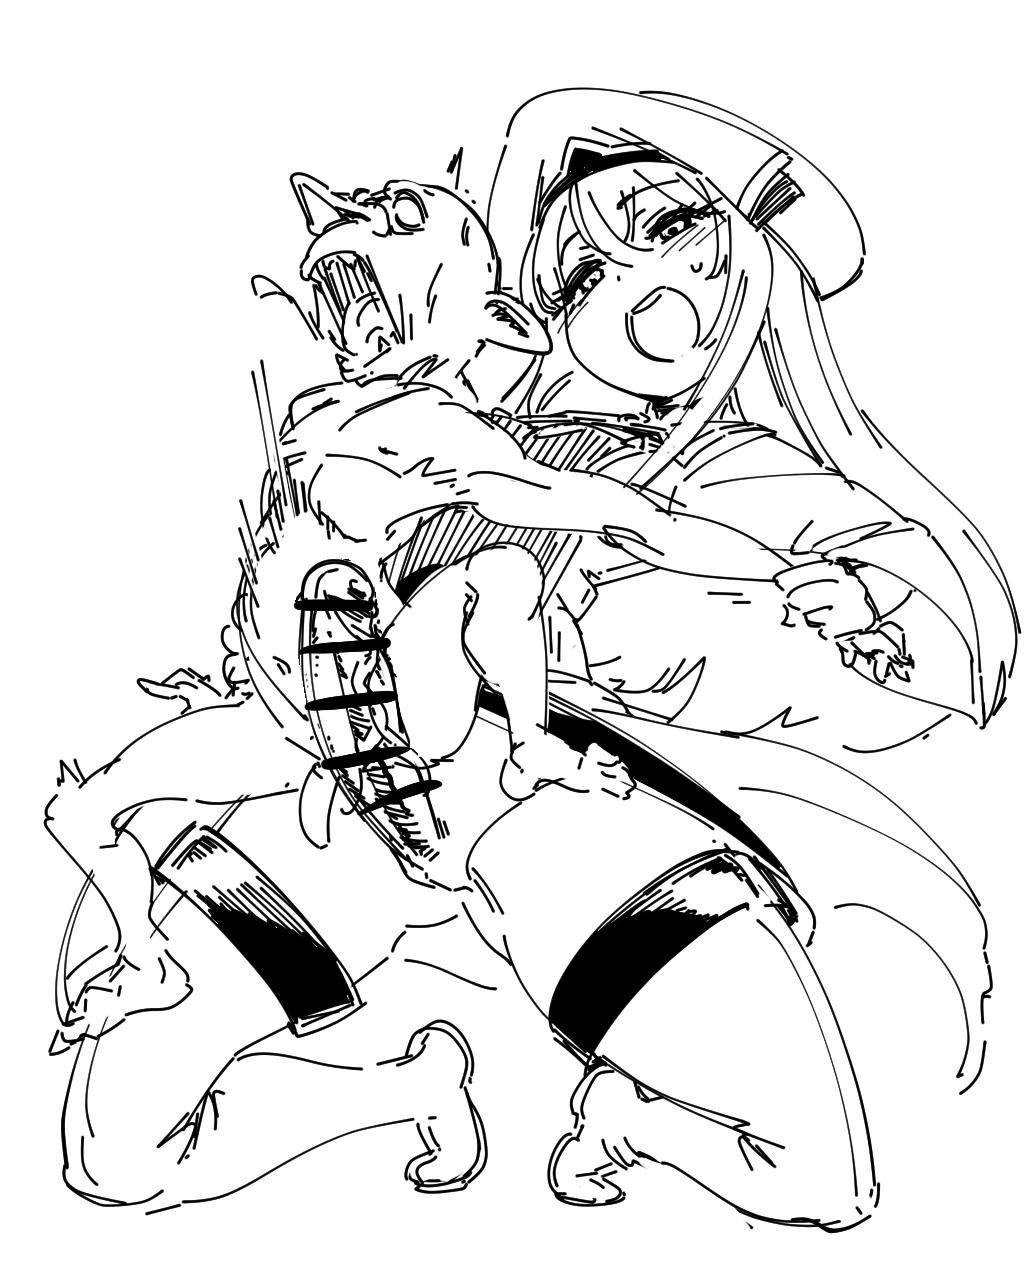 goblin a as slime reincarnated Shin sei yariman gakuen enoku